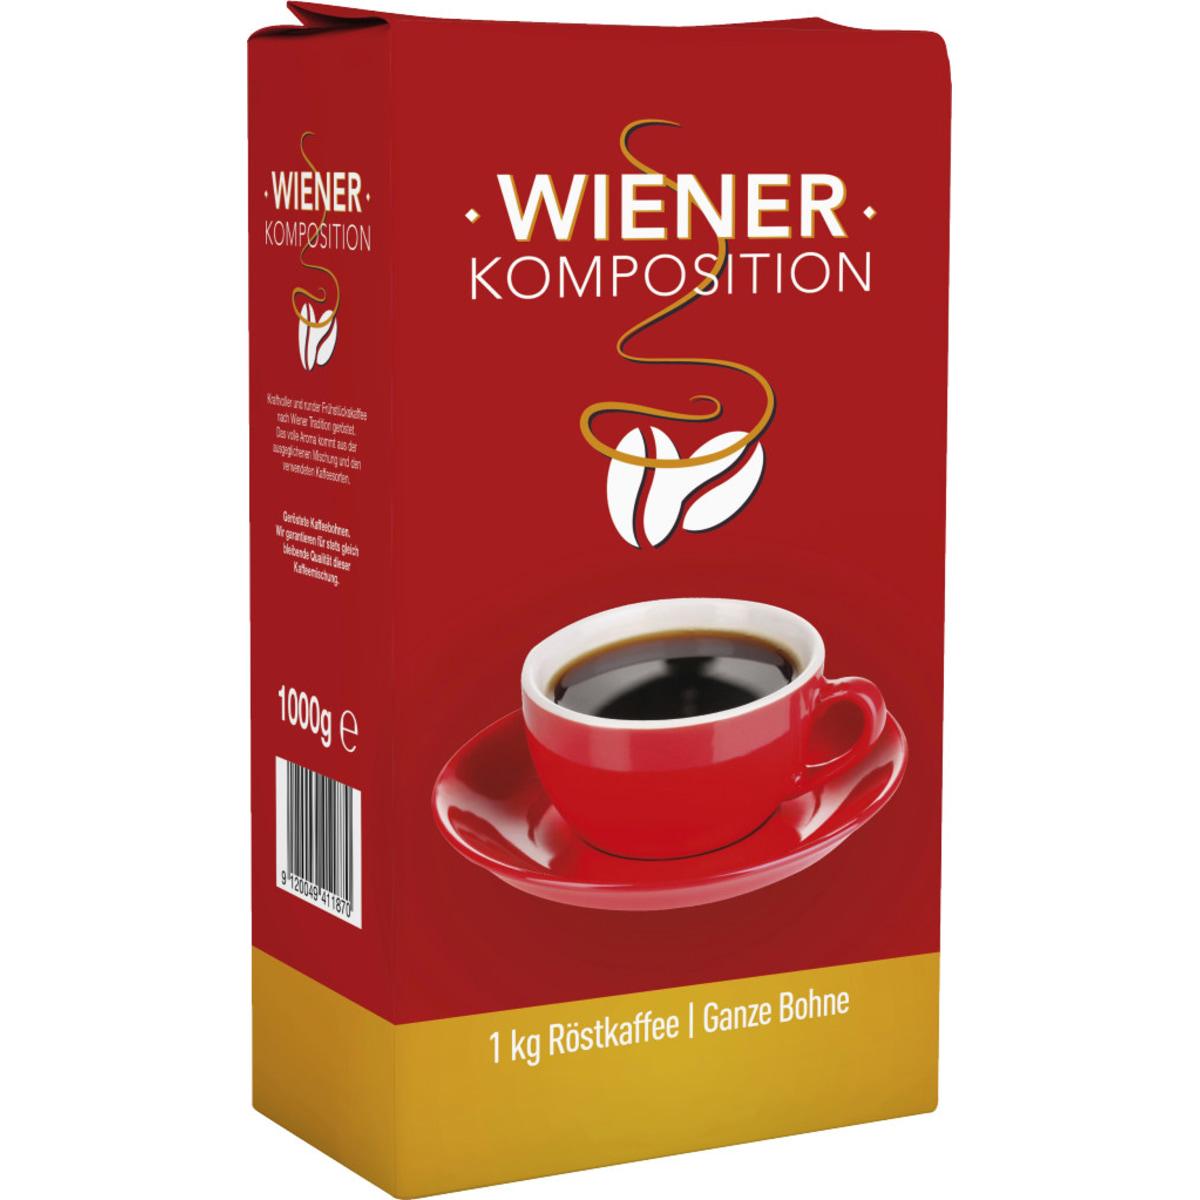 Wiener Komposition Bohnenkaffee